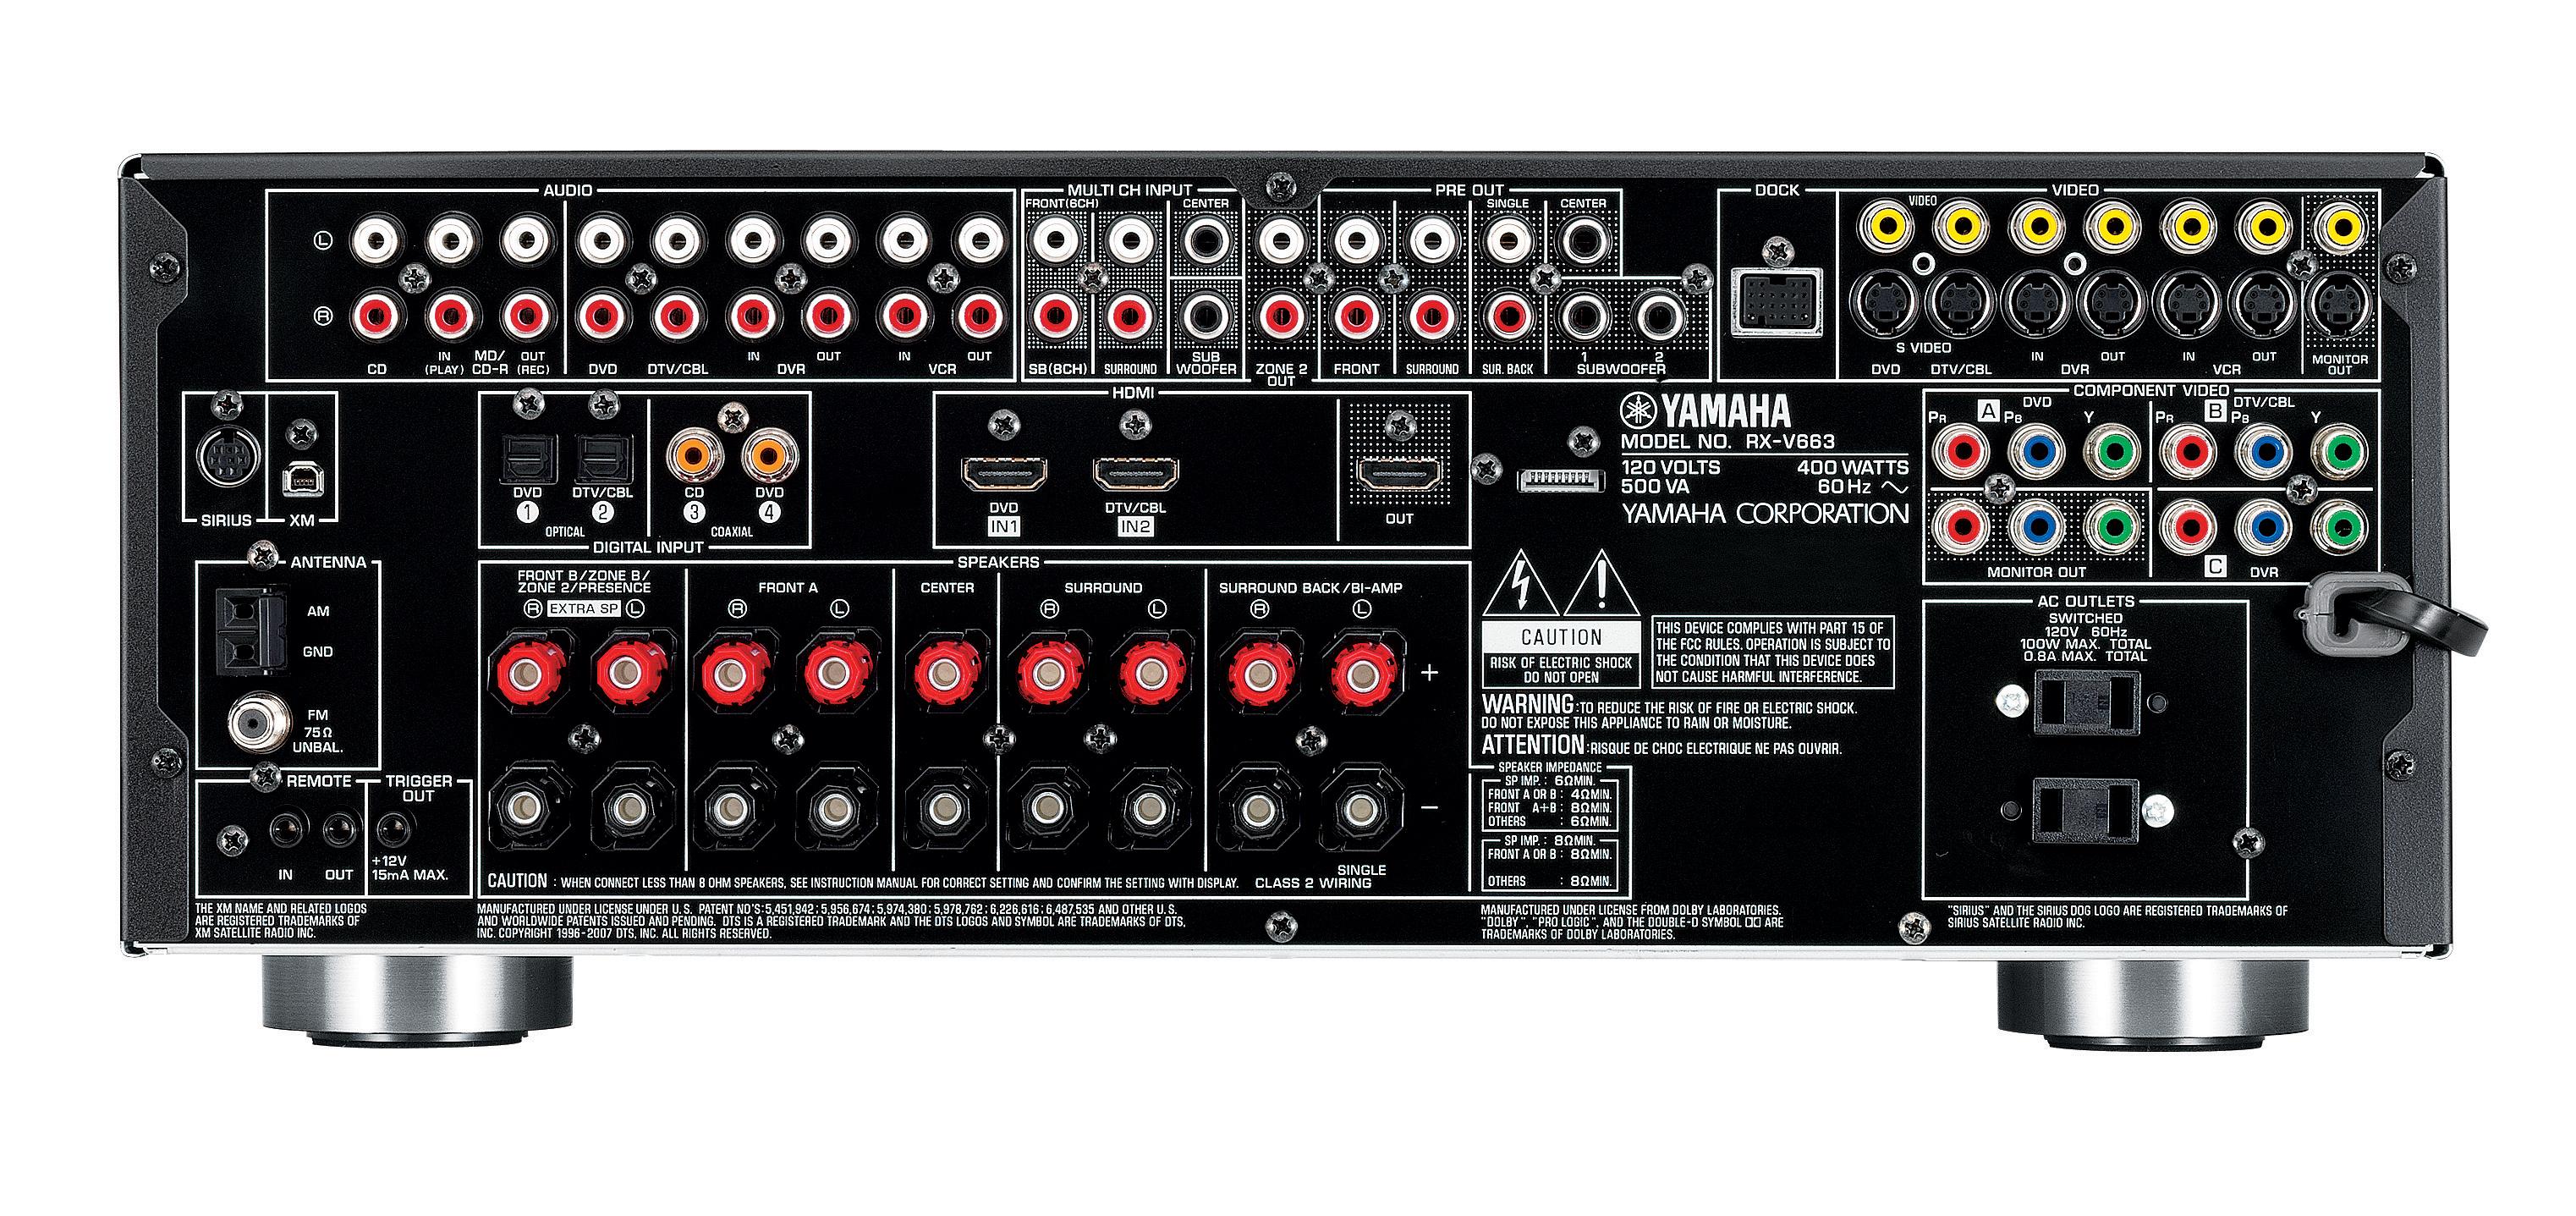 yamaha receiver manual rx v679